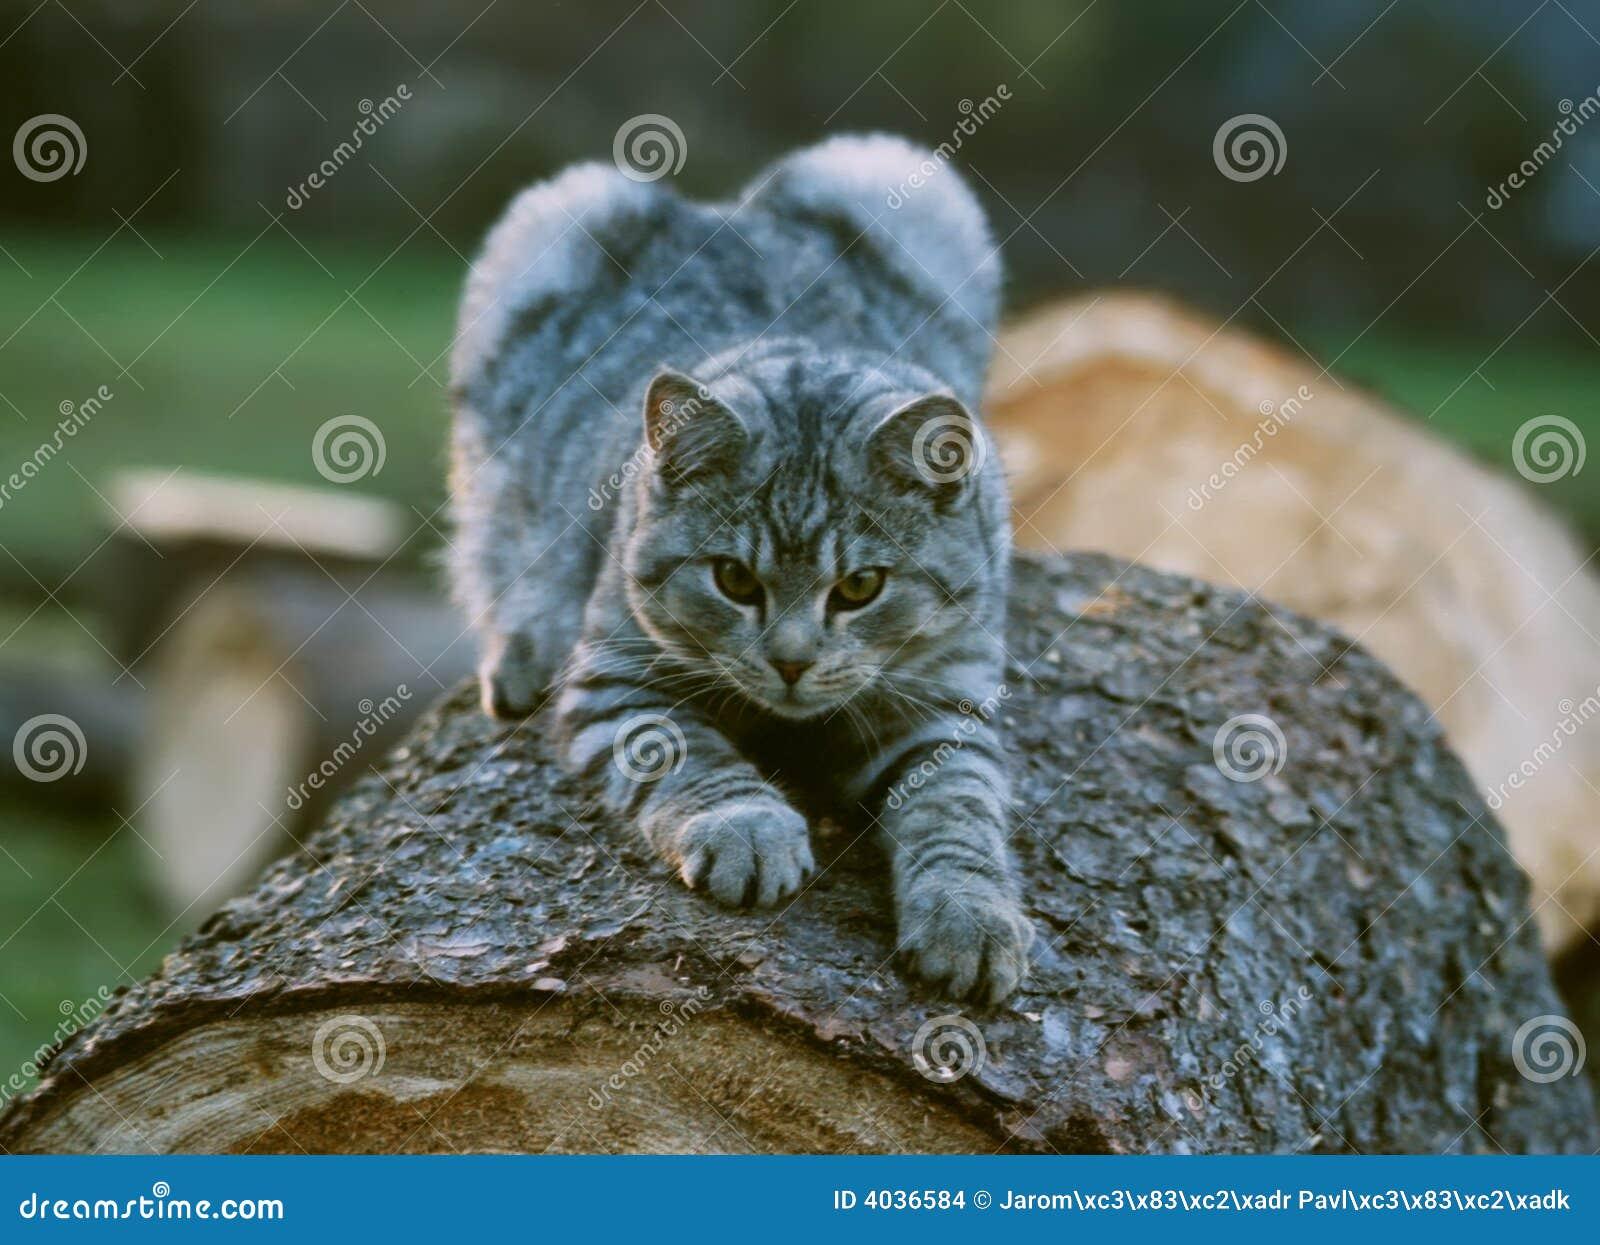 Gato antes de lunging